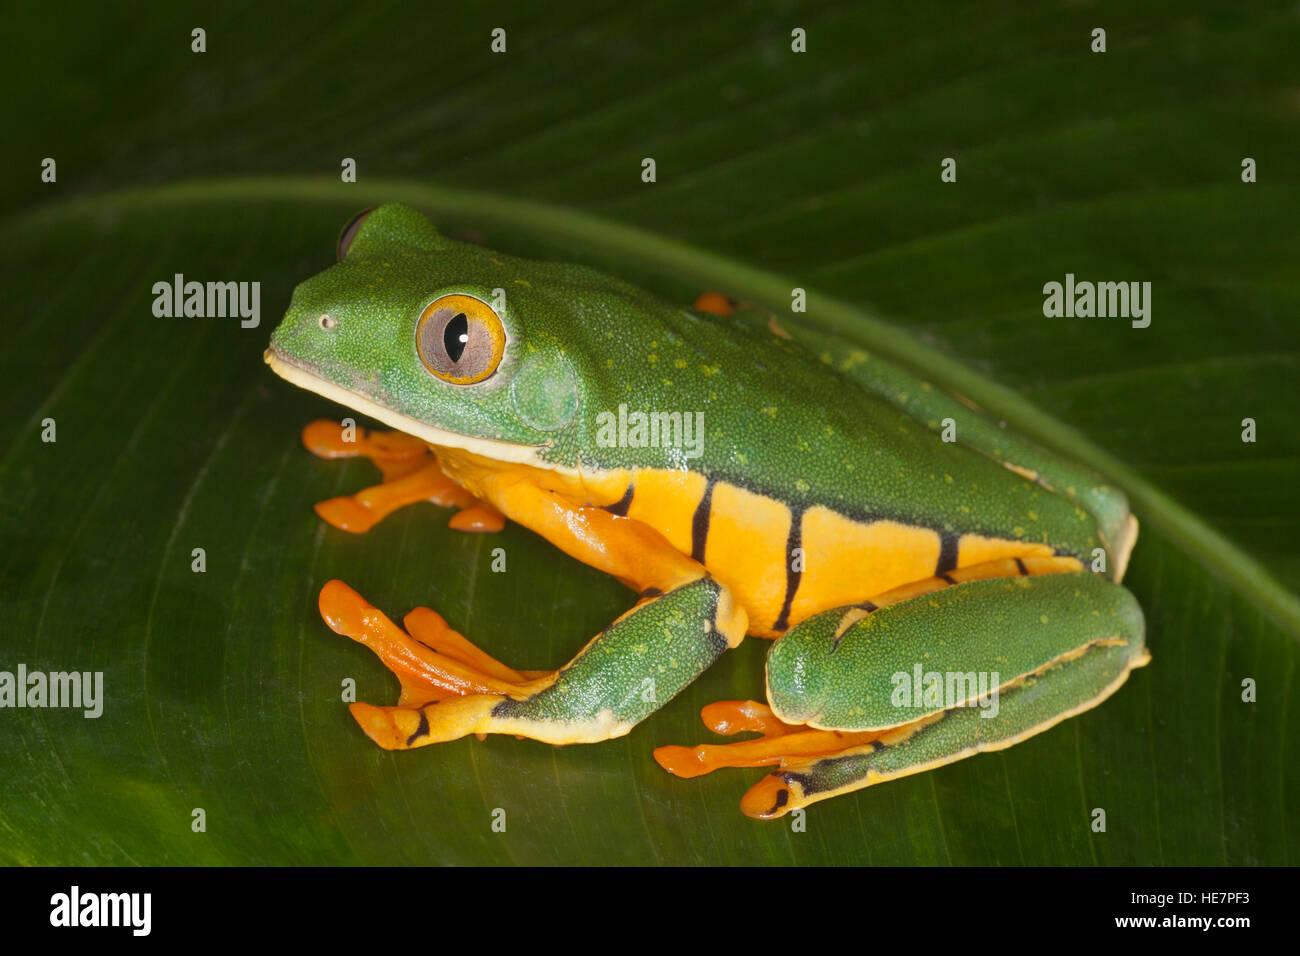 Golden-eyed Leaf Frog (Cruziohyla calcarifer) on leaf Stock Photo